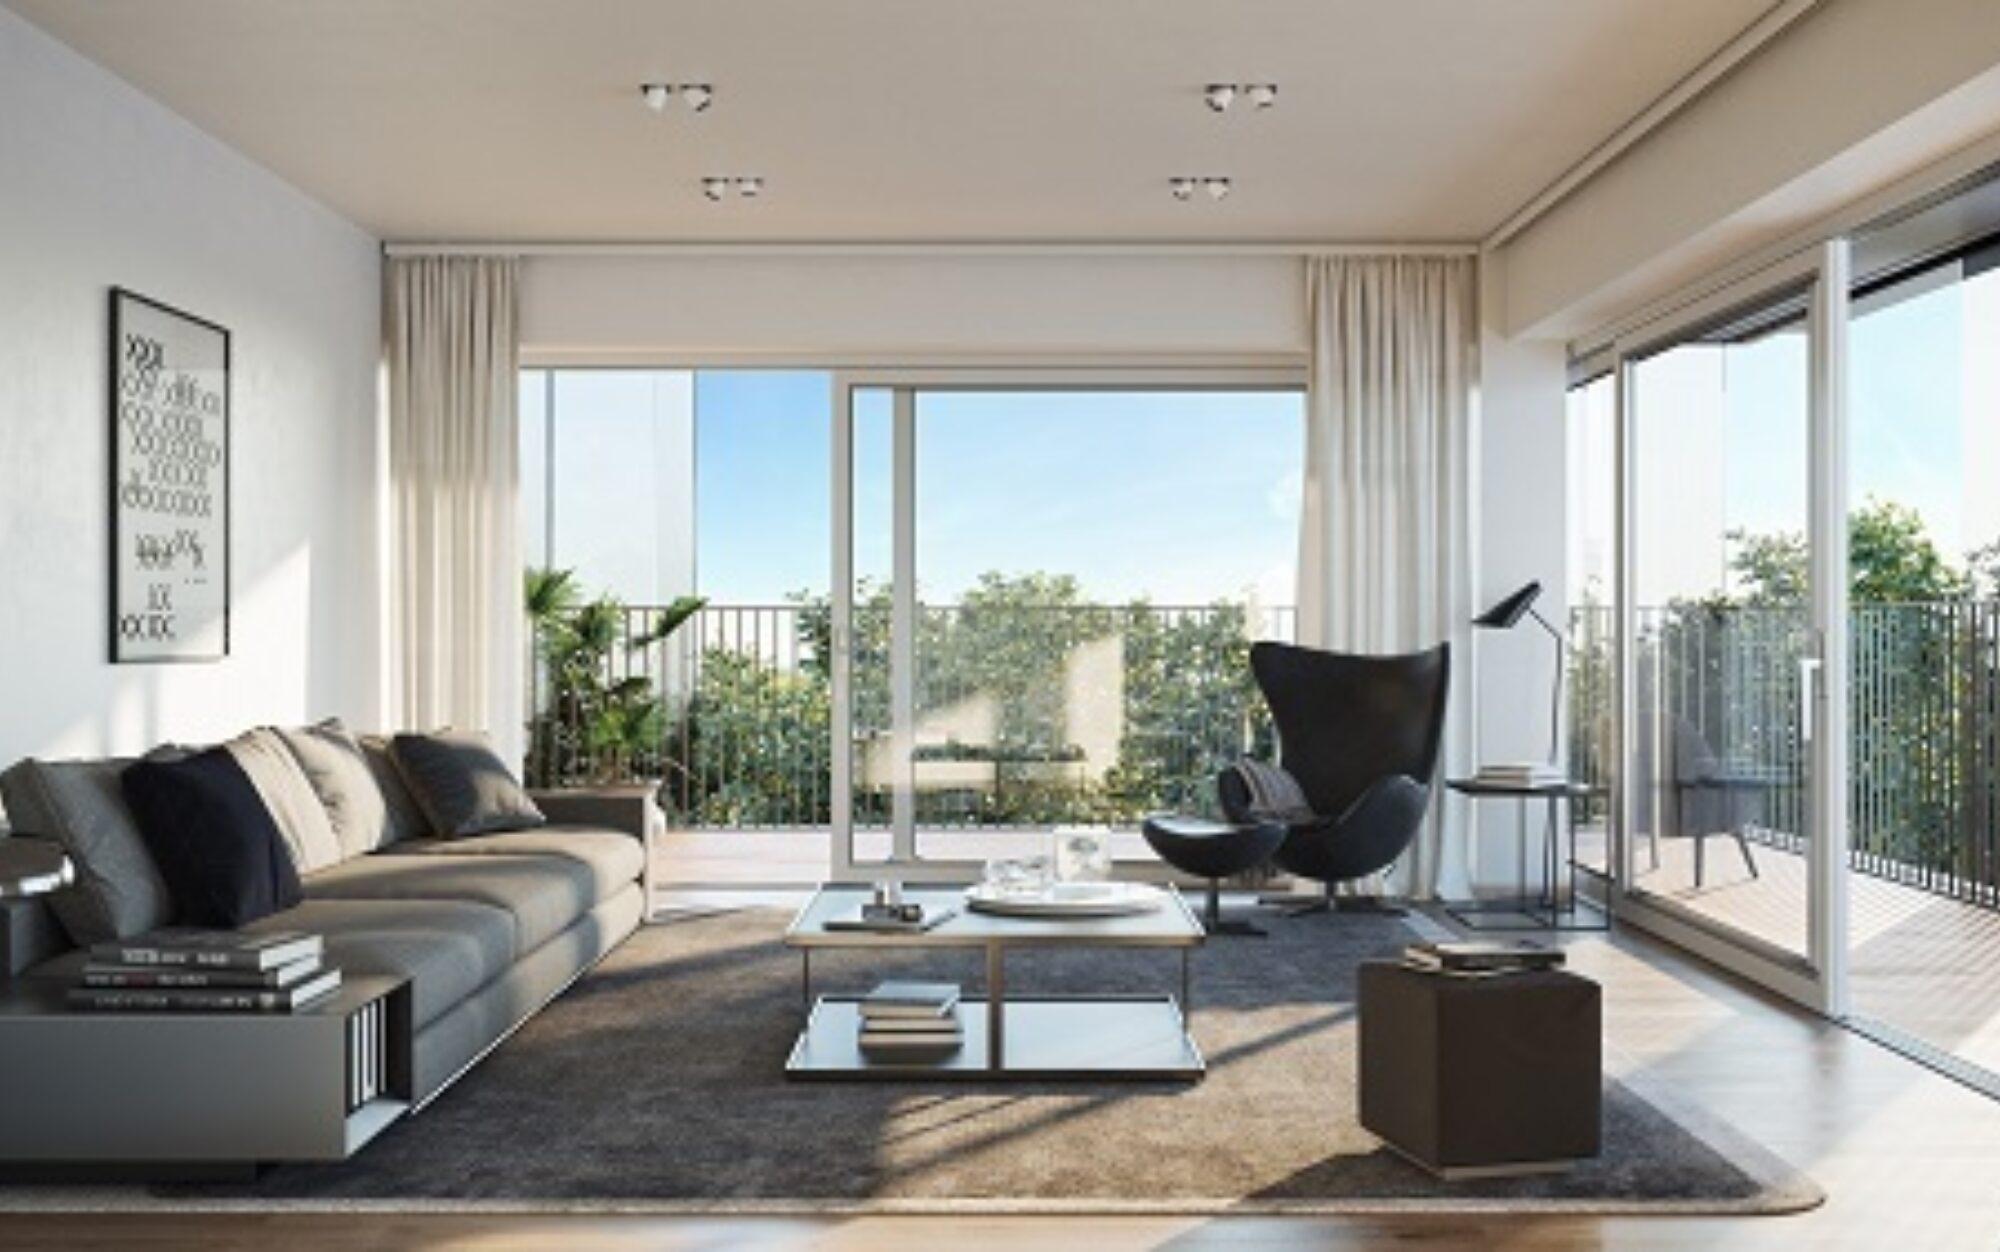 Kolmont Refuga Urban Villa Hasselt corner suites interior